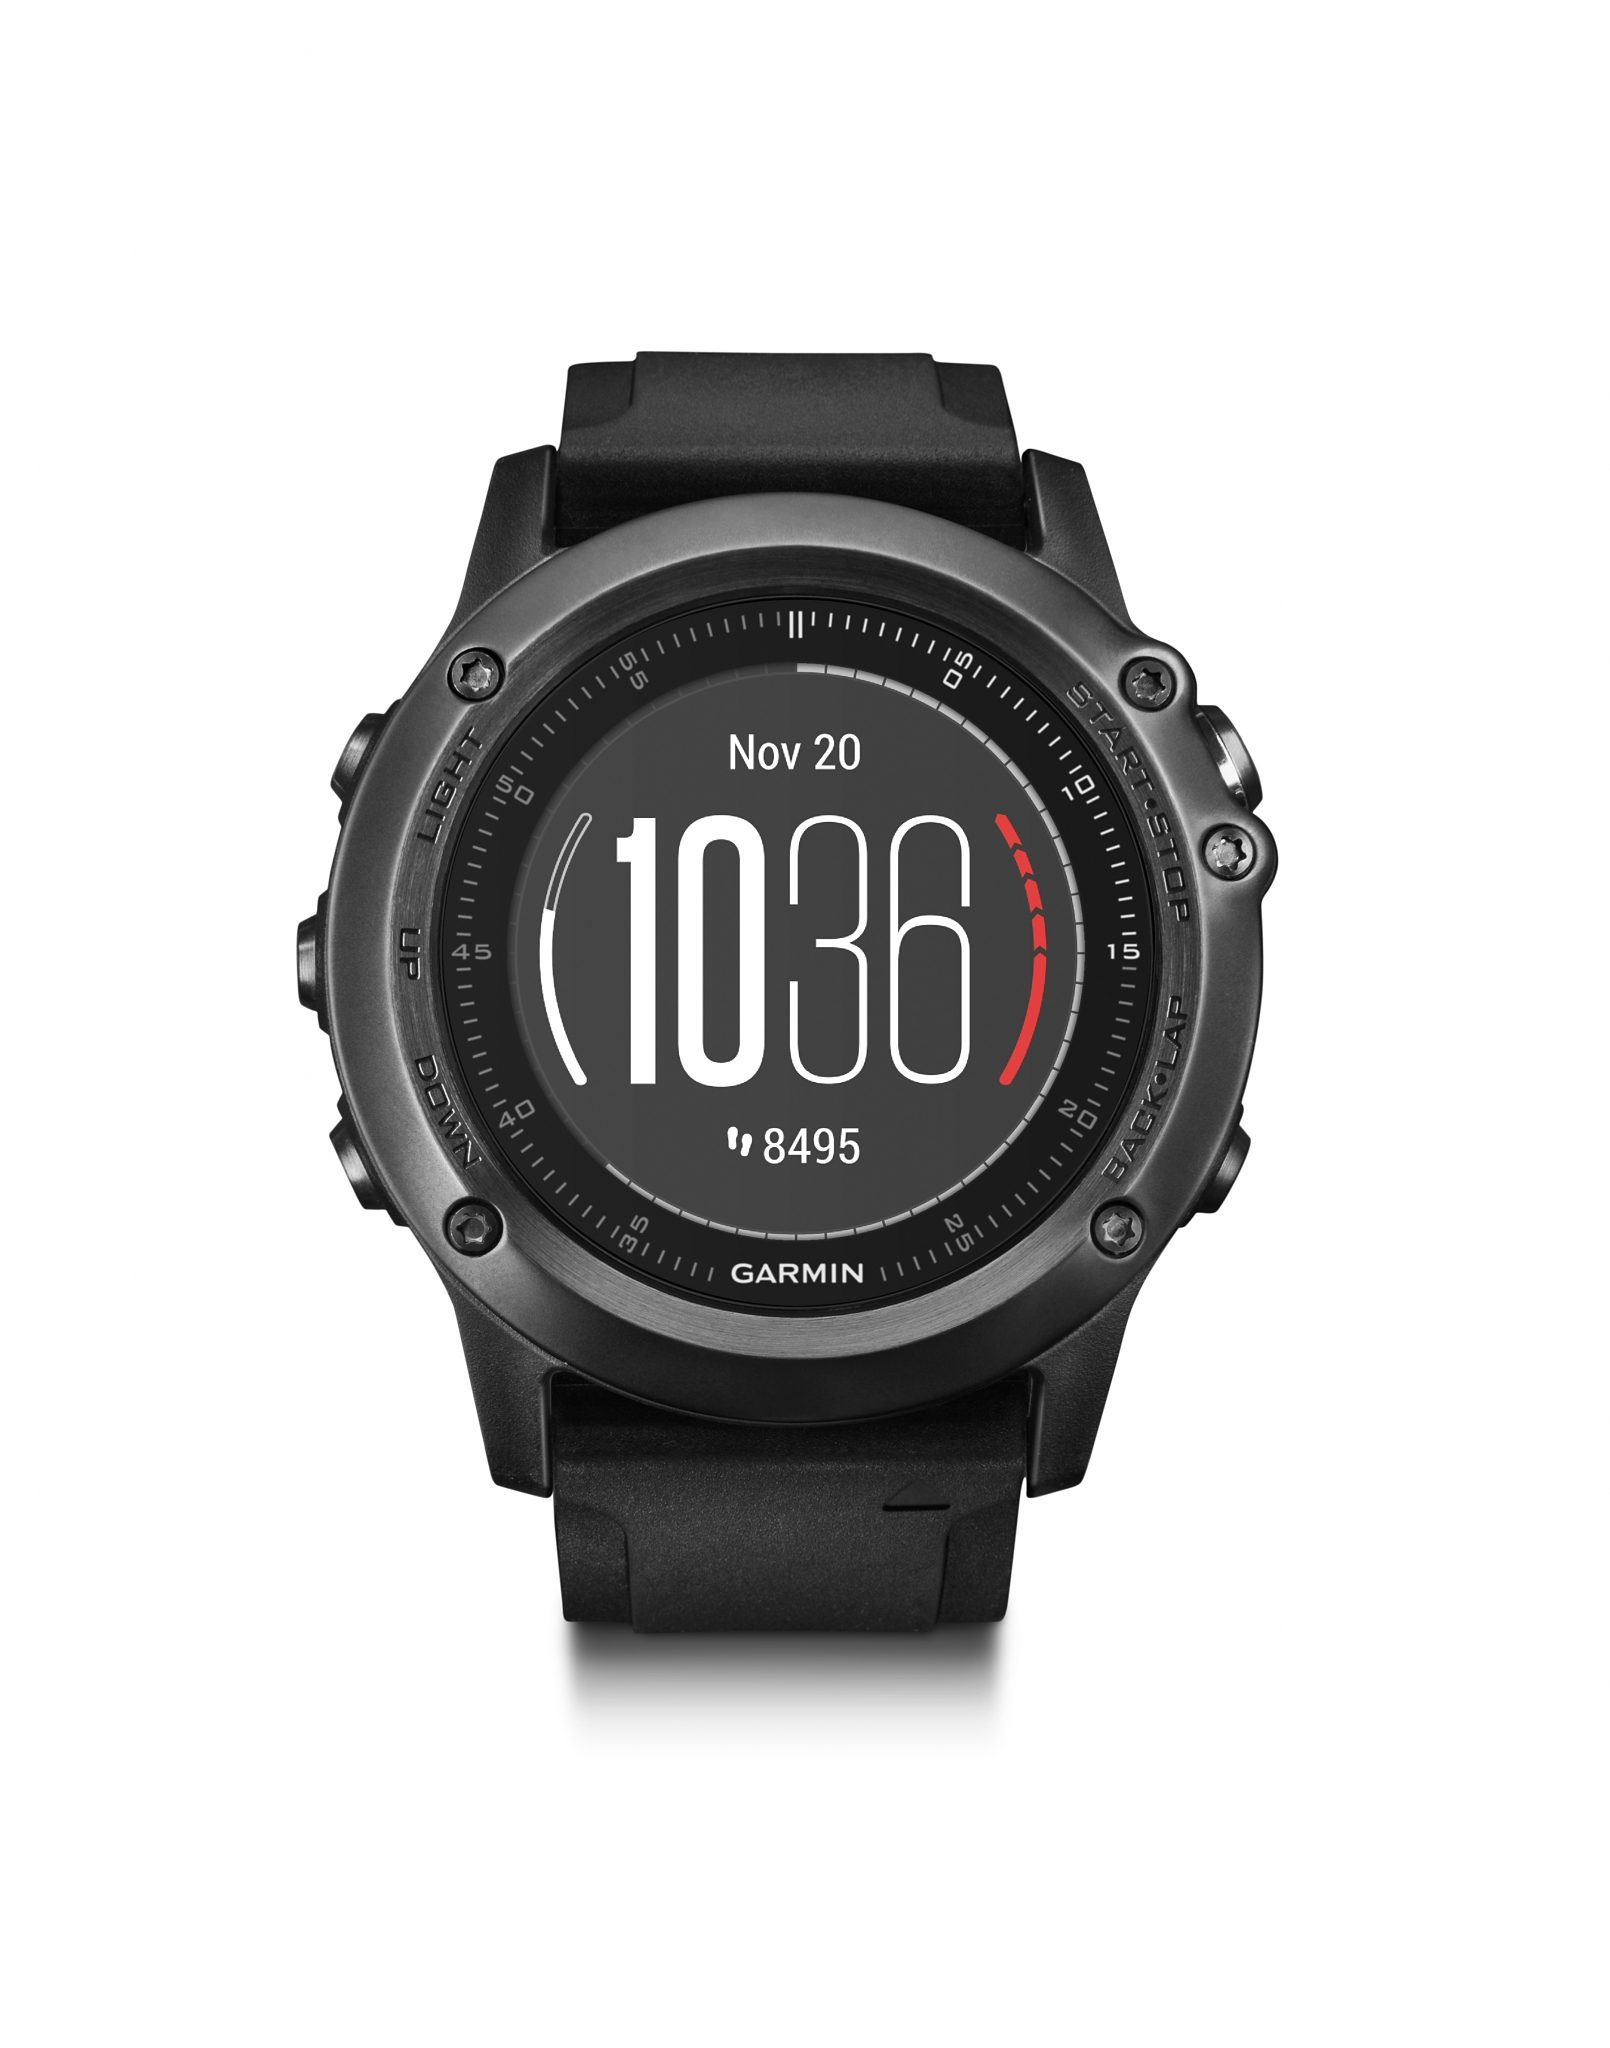 Garmin Sportuhr »fenix 3 HR Saphir GPS Multisportuhr Performer«